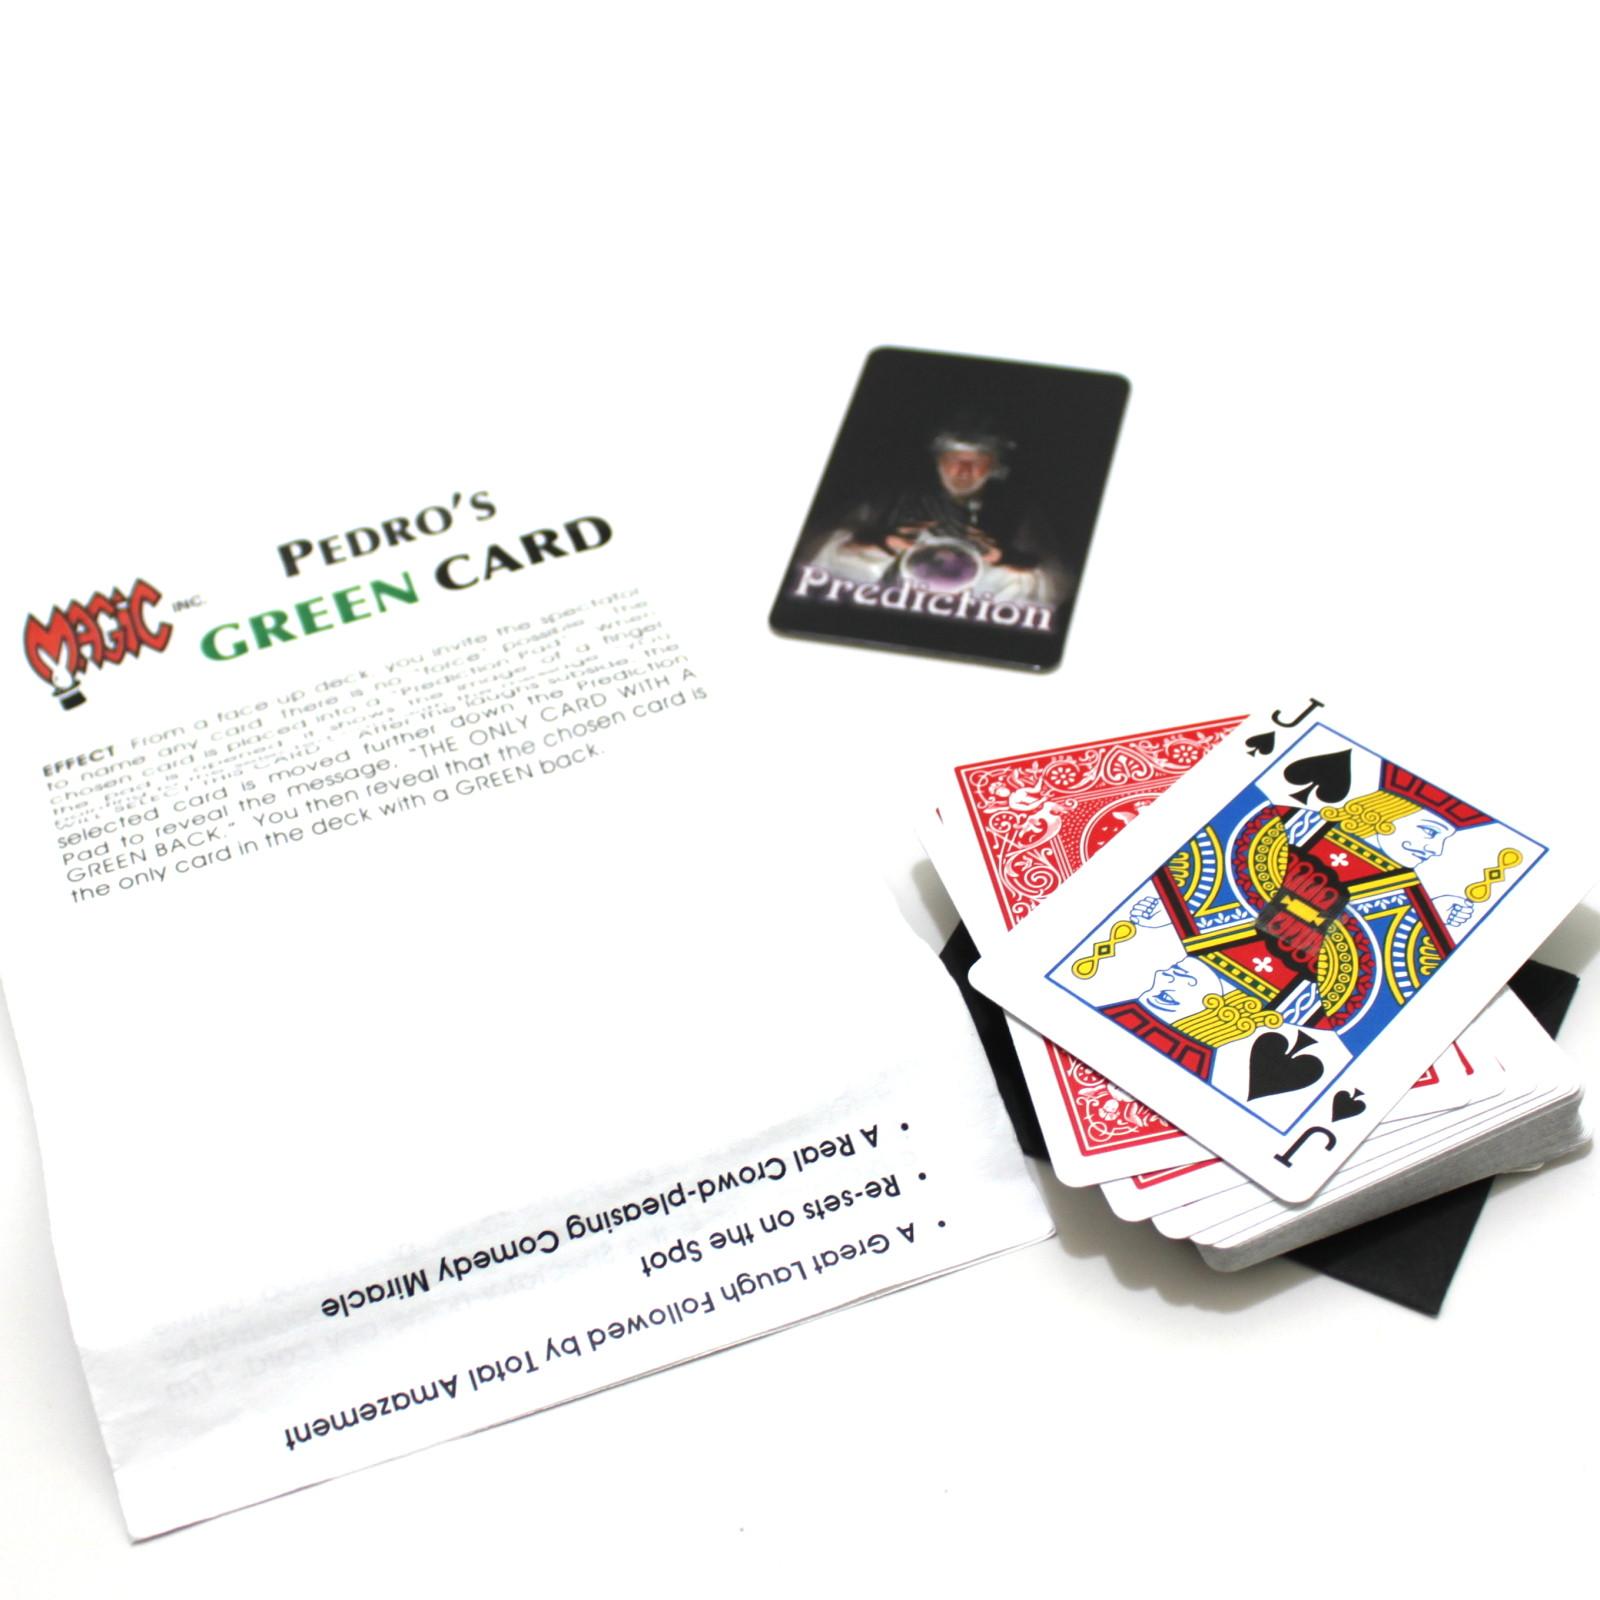 Pedro's Green Card by Magic Inc.